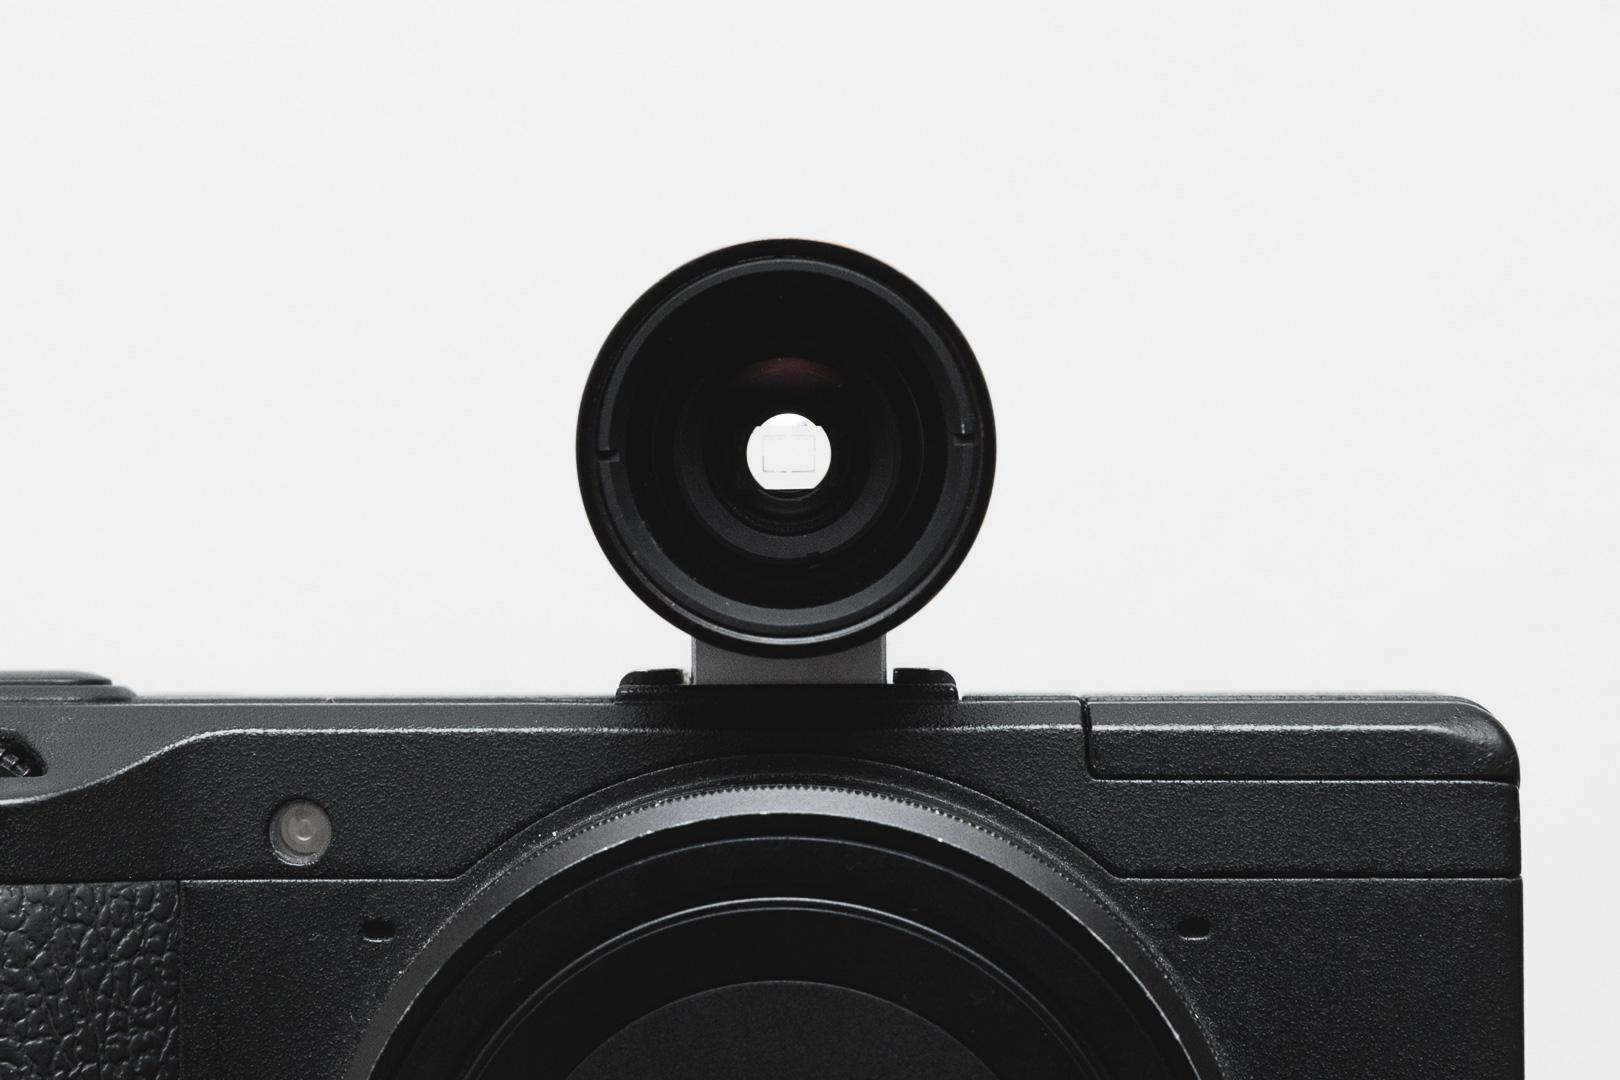 Voigtlander-35mm-Brightline-Finder-Ant Tran-20170402-3018.jpg